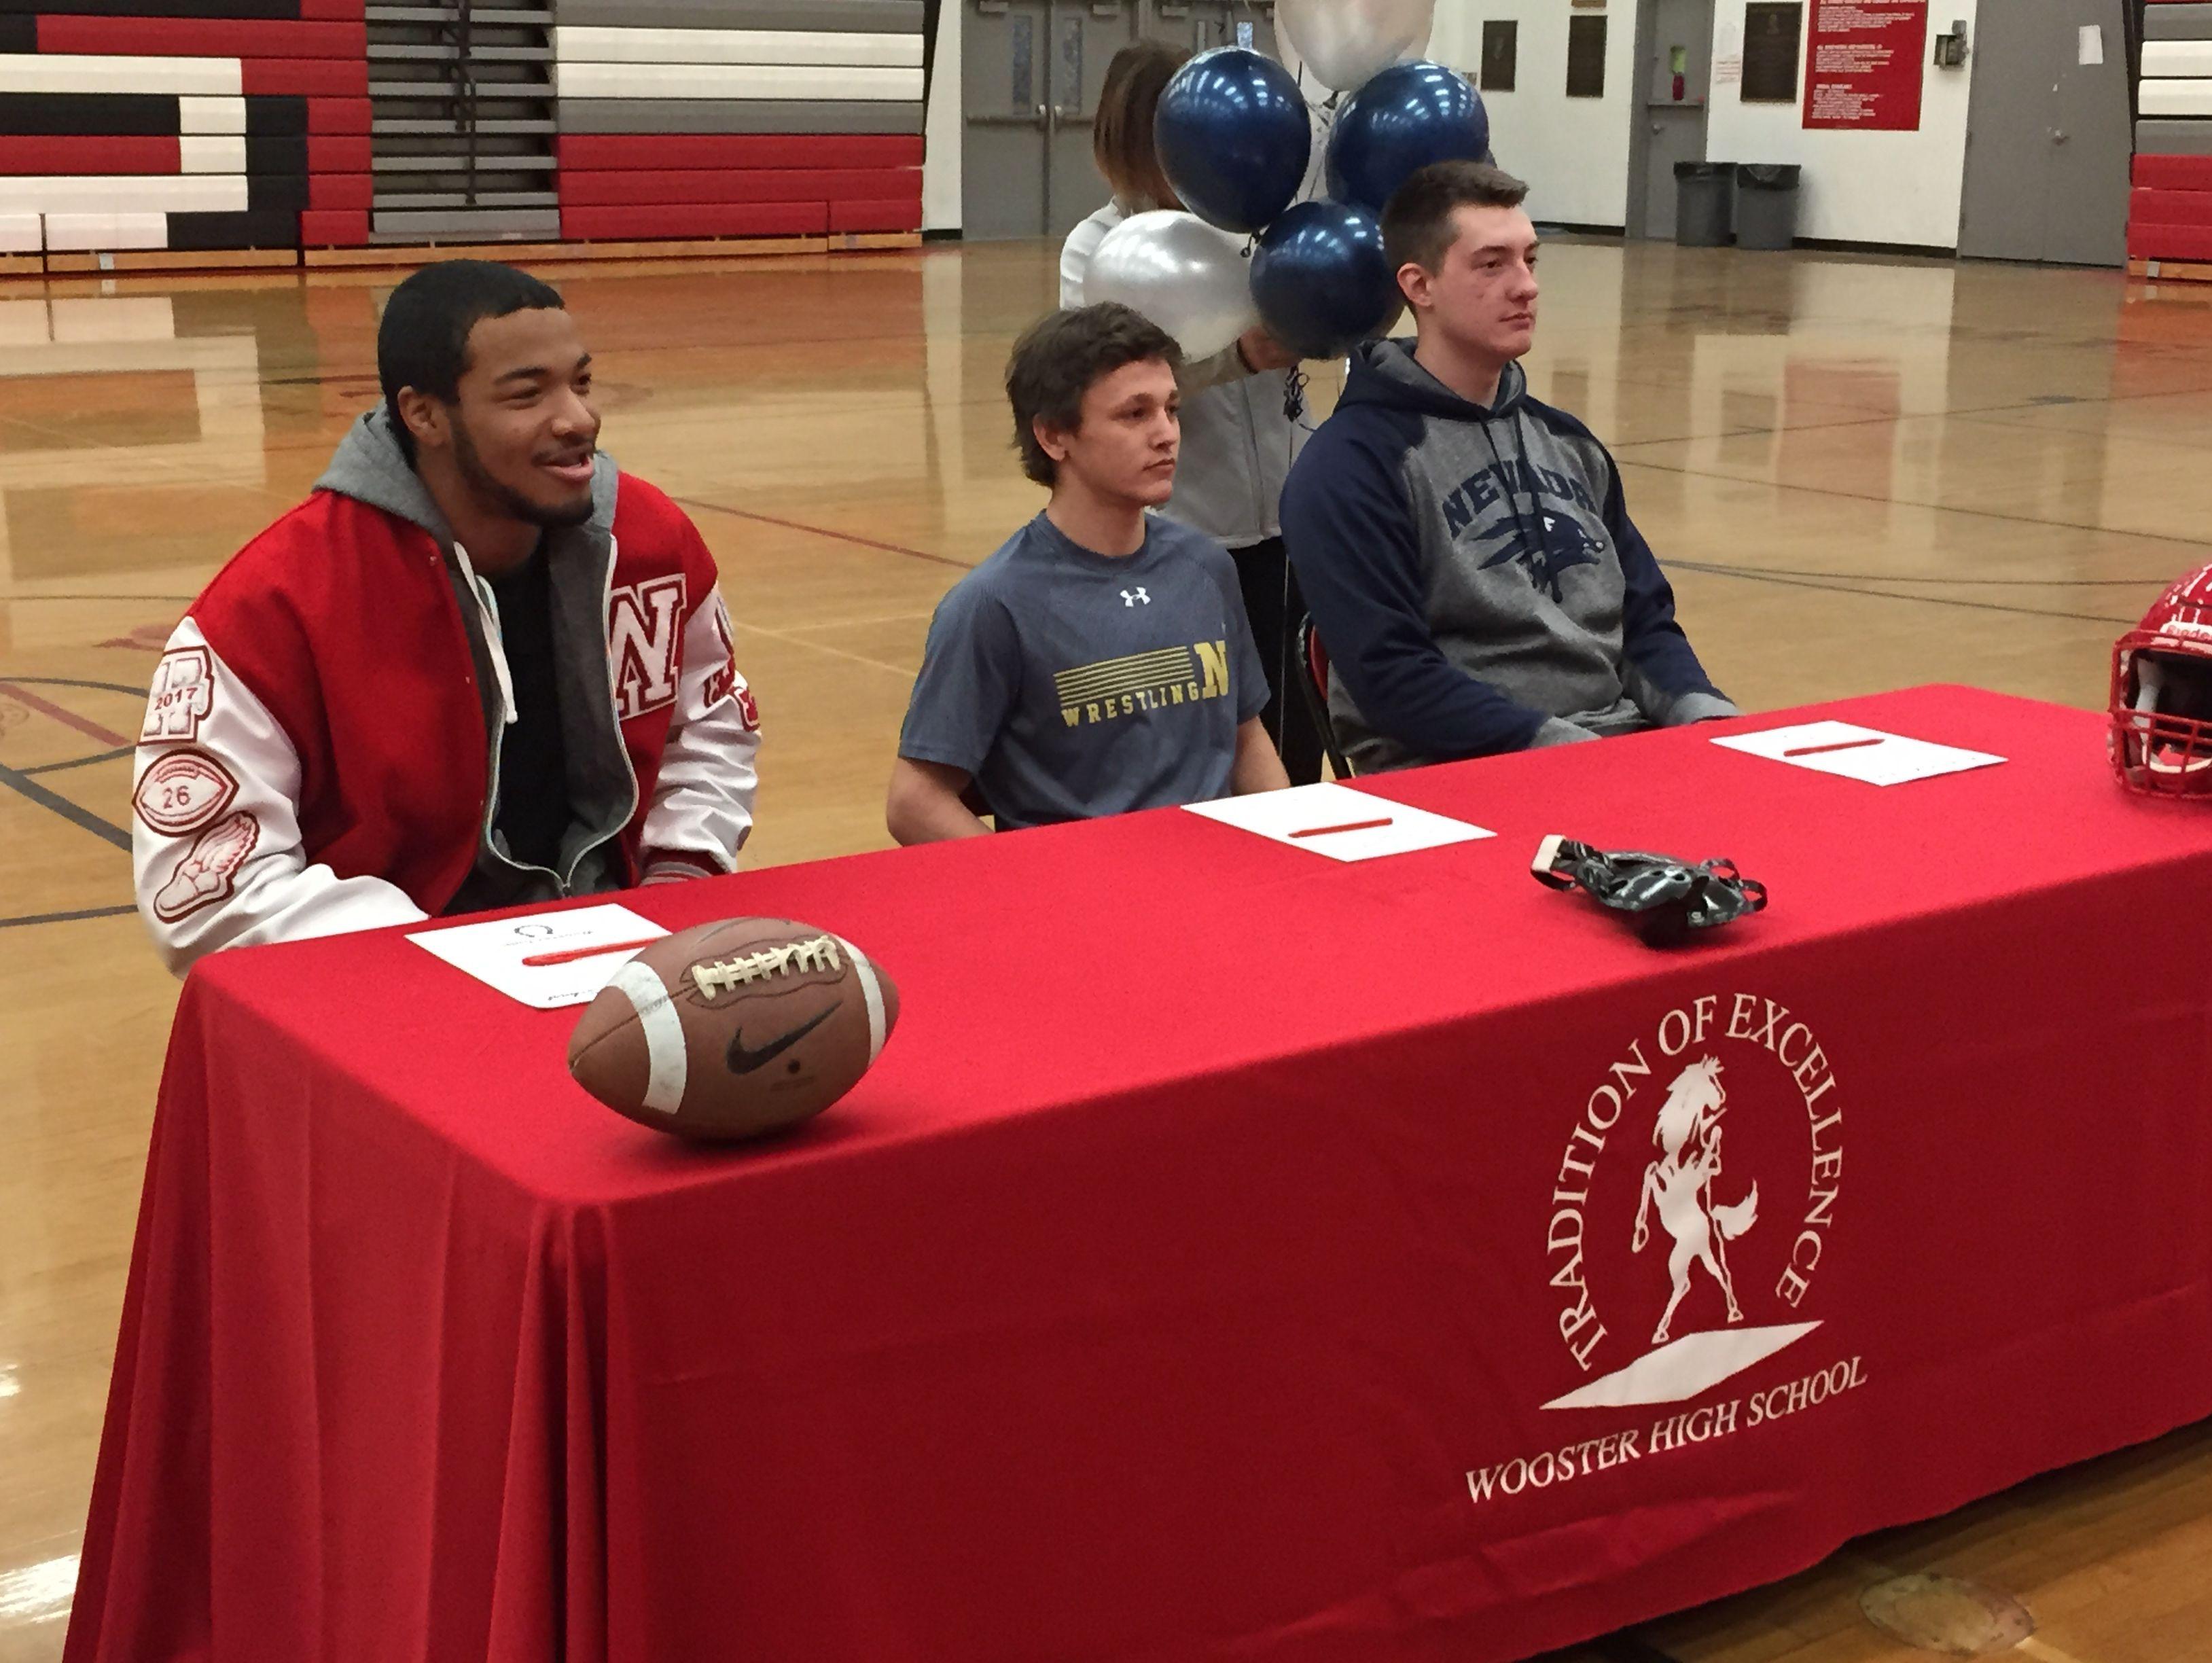 The Colts had three athletes sign: Romeo Okorie (football) Jamestown University; Ian Timmins (wrestling) United States Naval Academy; Karson Thomas (football) Nevada;